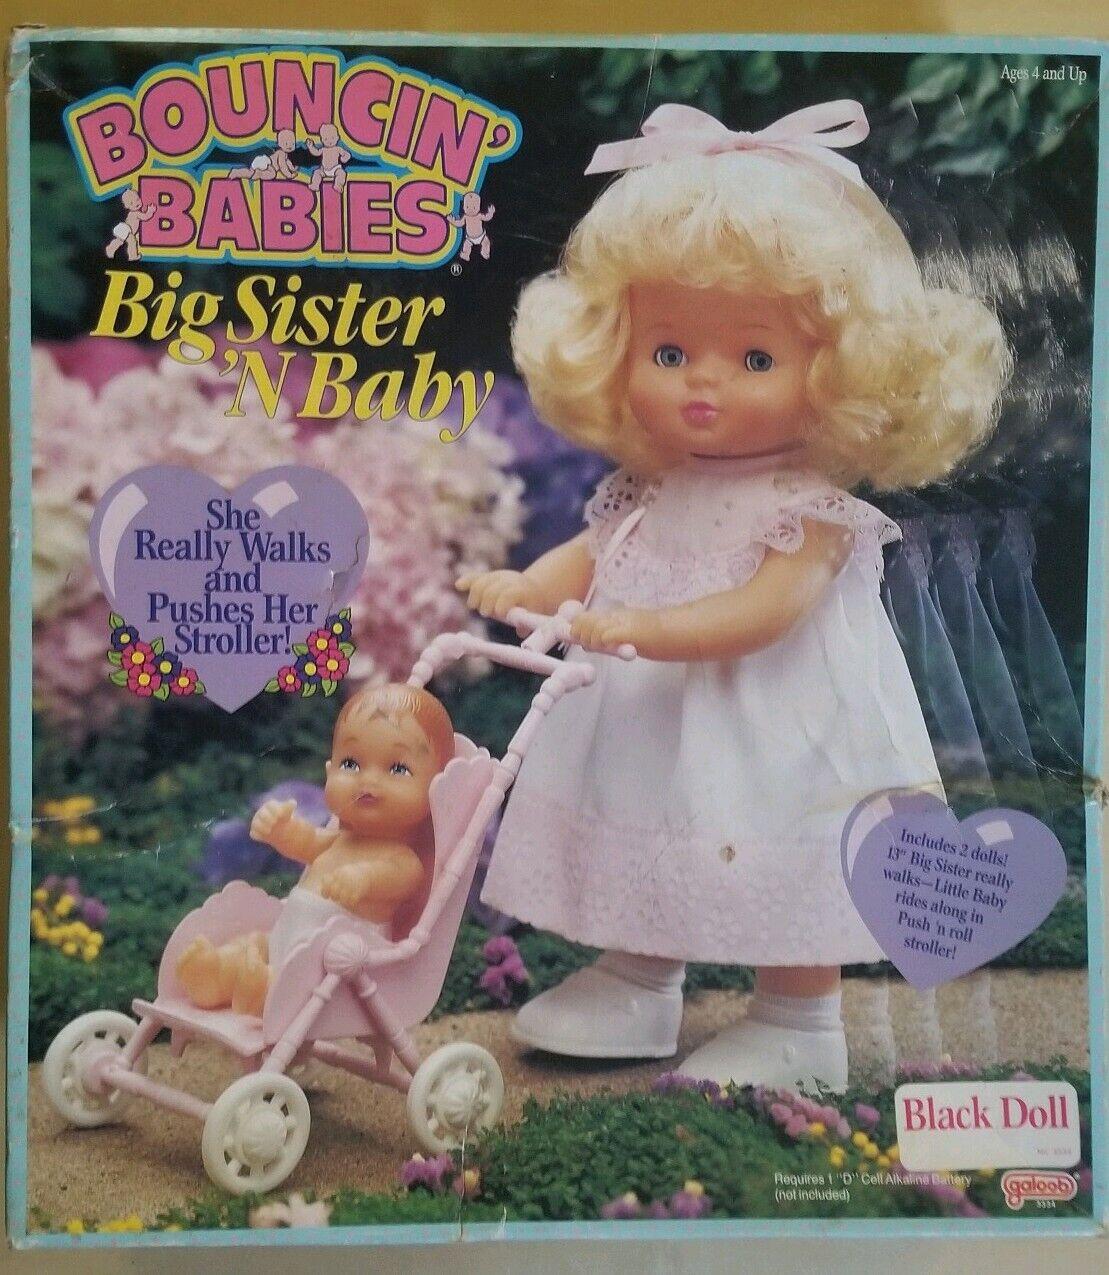 K&e 'bebé hermana n Bebé Galoob 1990 2 Muñecas afroamericano Caja de daños